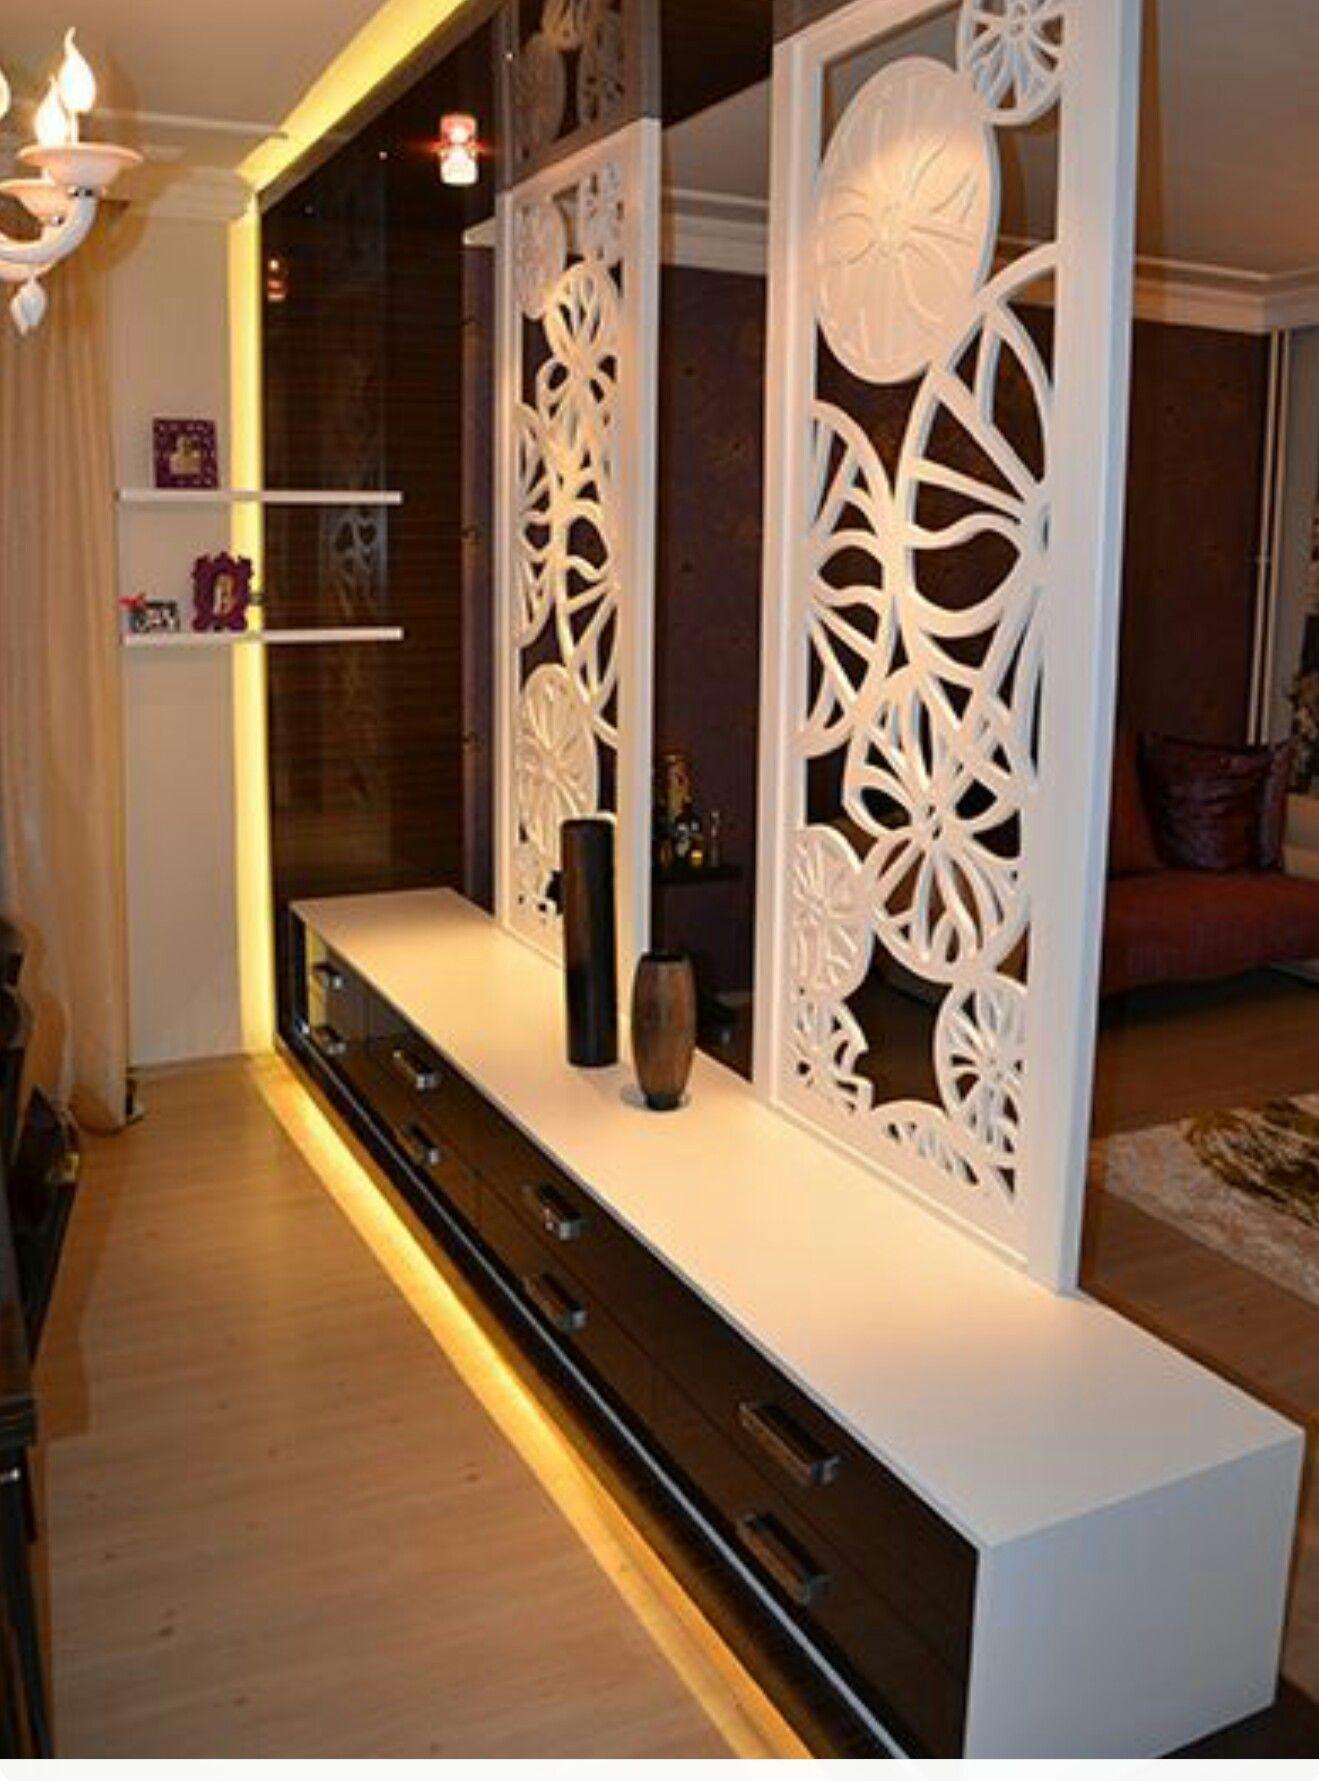 Partition design wood luxury bedroom tv unit sofa also best interior furniture decorating ideas decor units rh pinterest